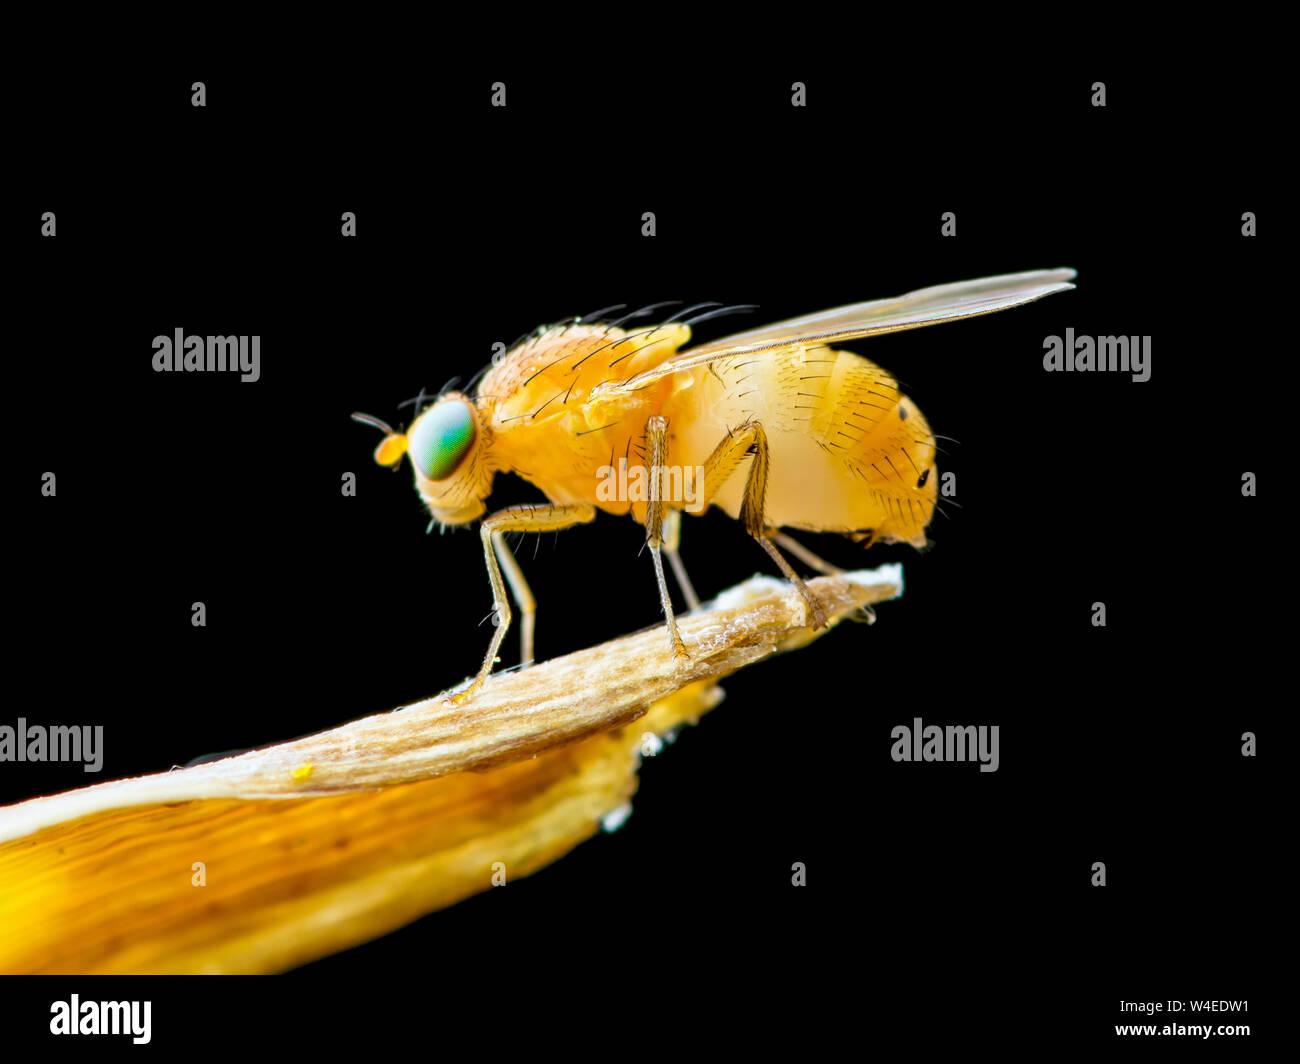 Exotic Drosophila Fruit Fly Diptera Insect on Plant Isolated on Black Background Stock Photo